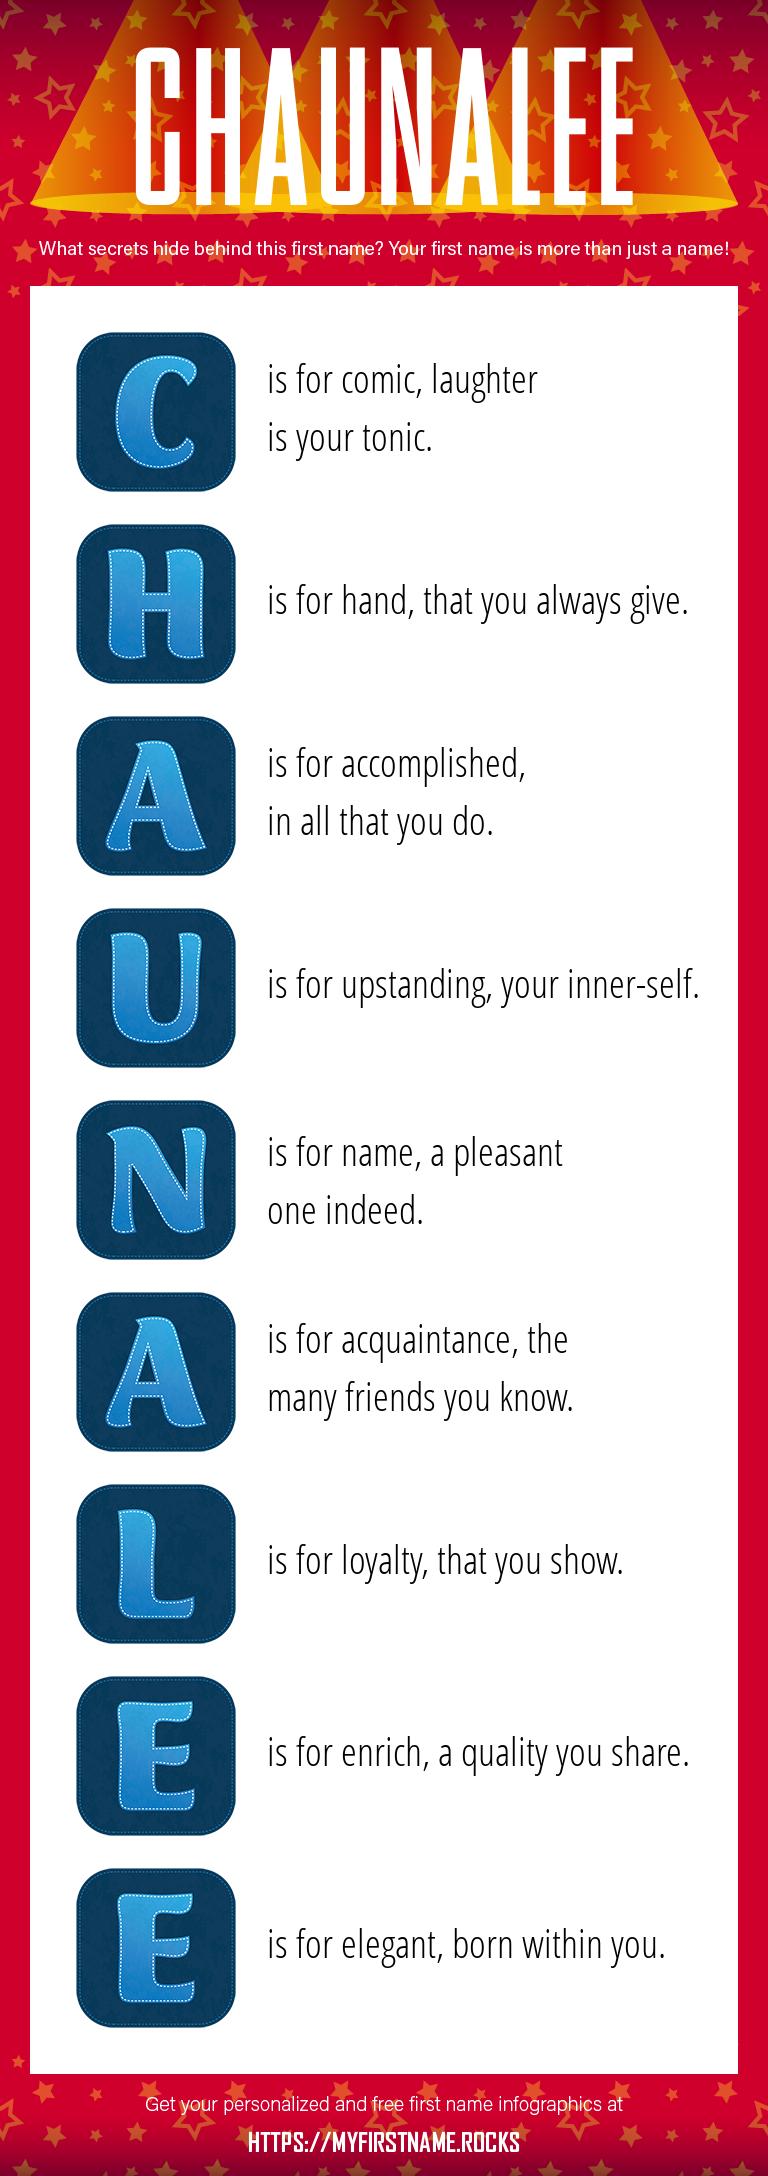 Chaunalee Infographics